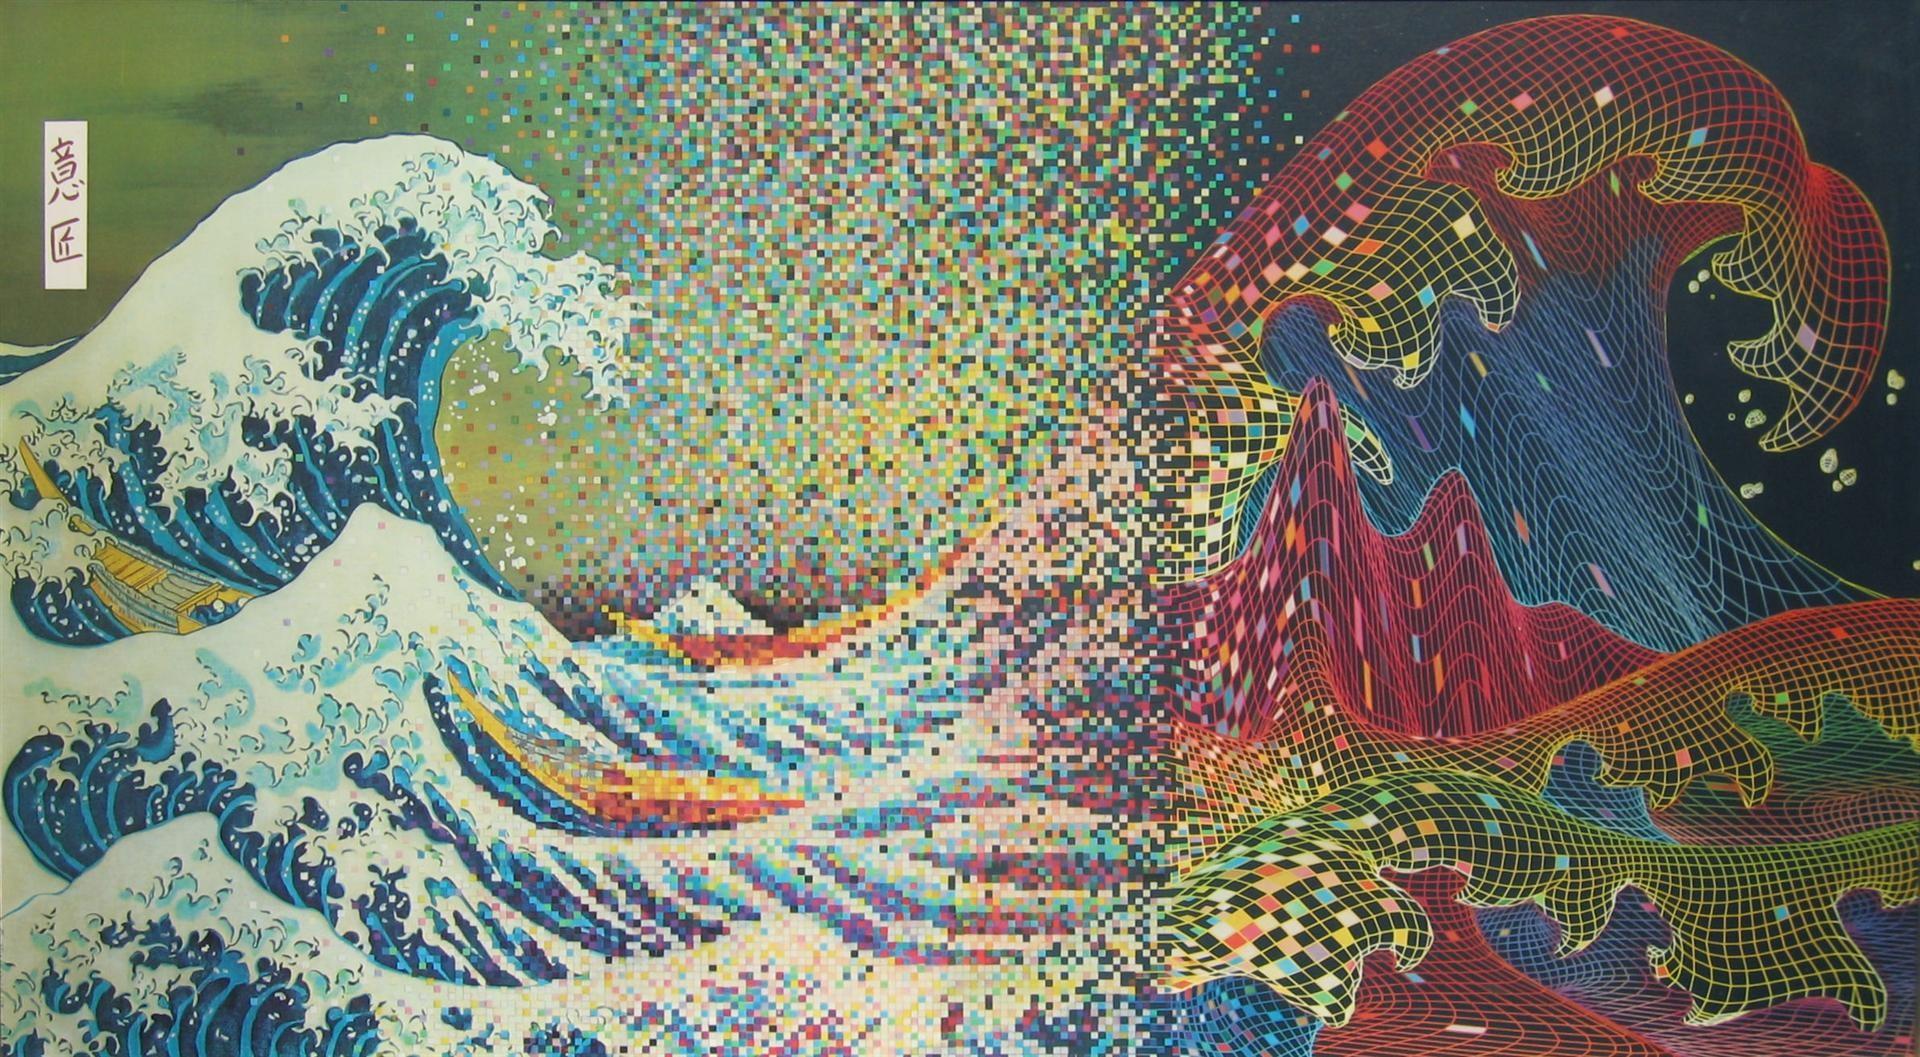 pixel art digital art traditional art waves